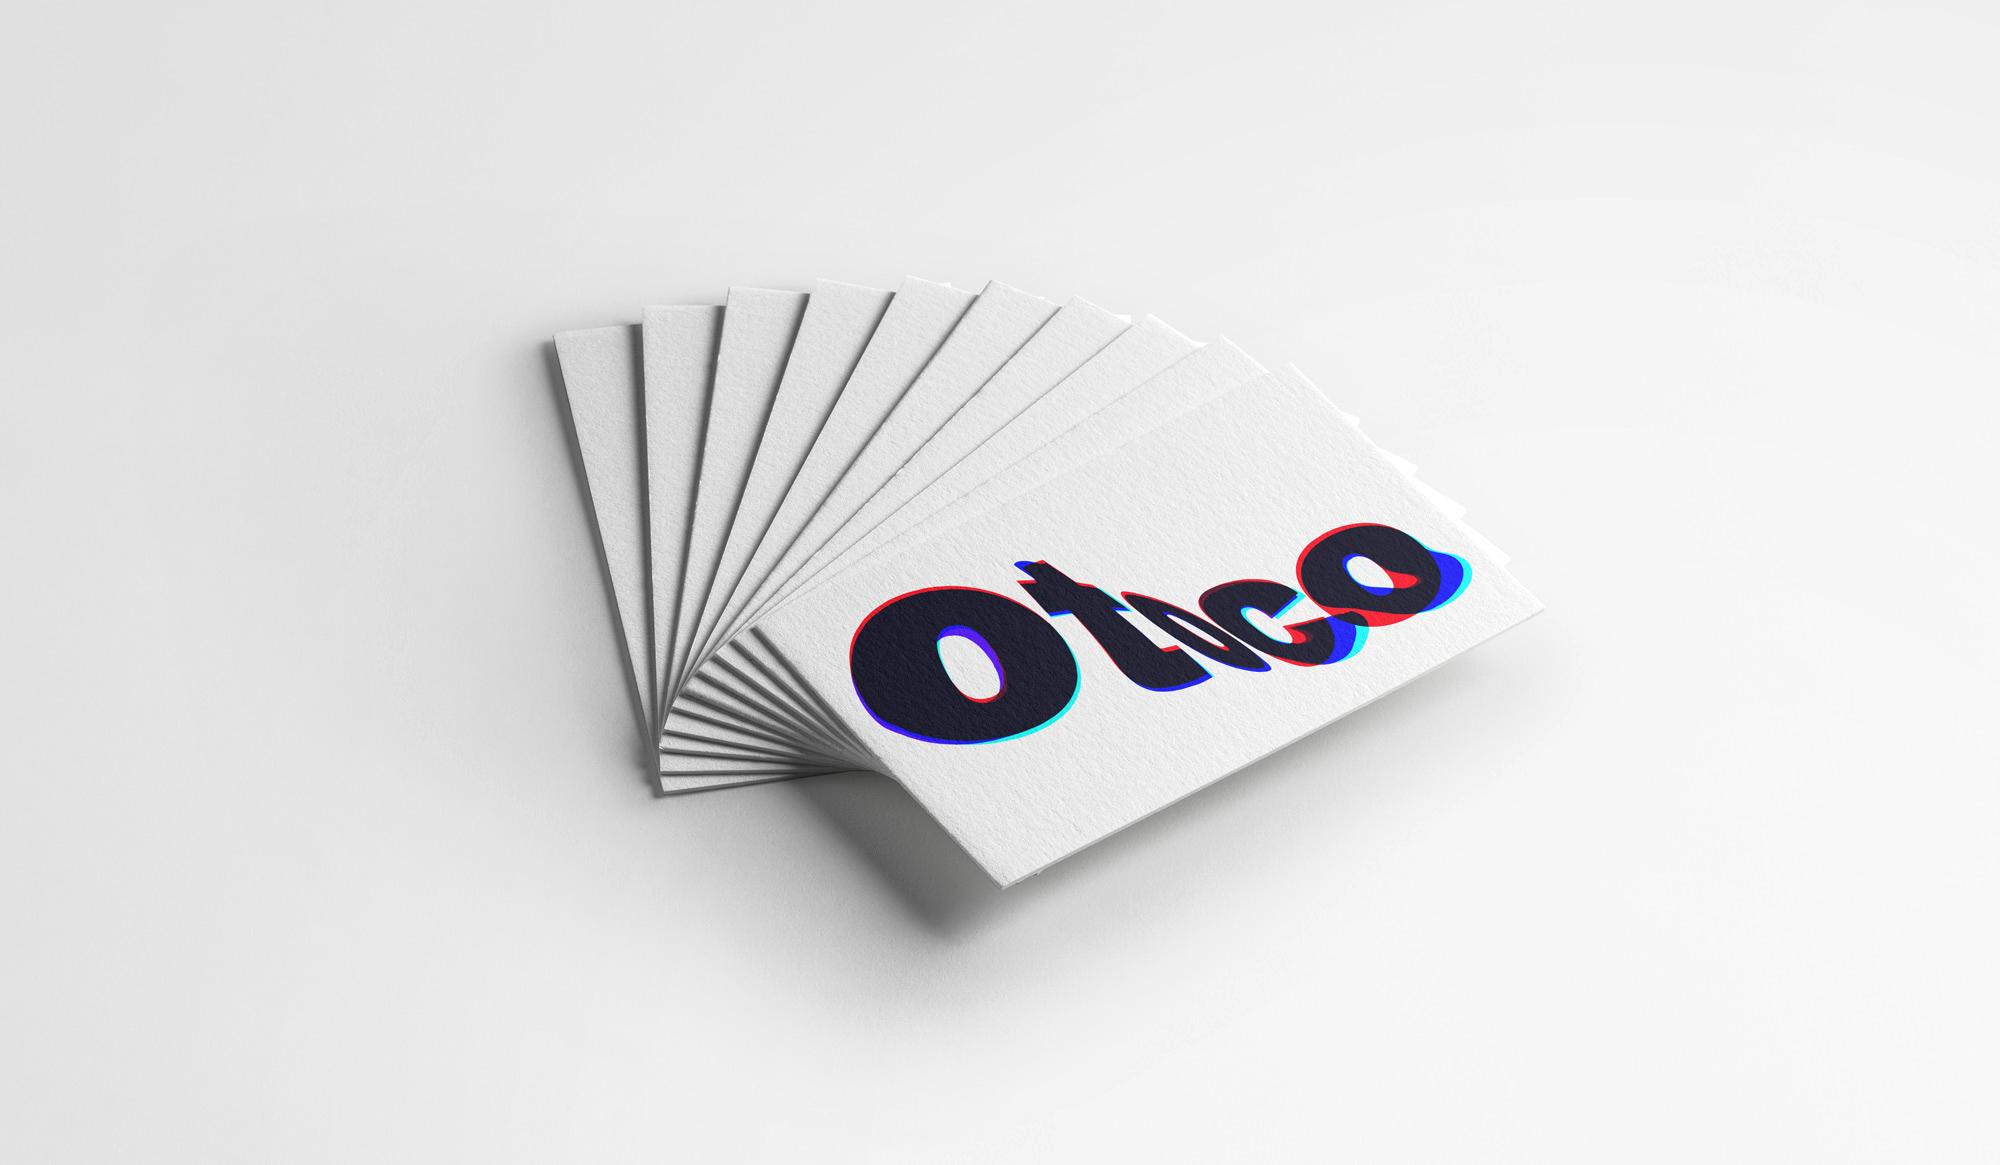 vlevle-otoco-business-card.jpg